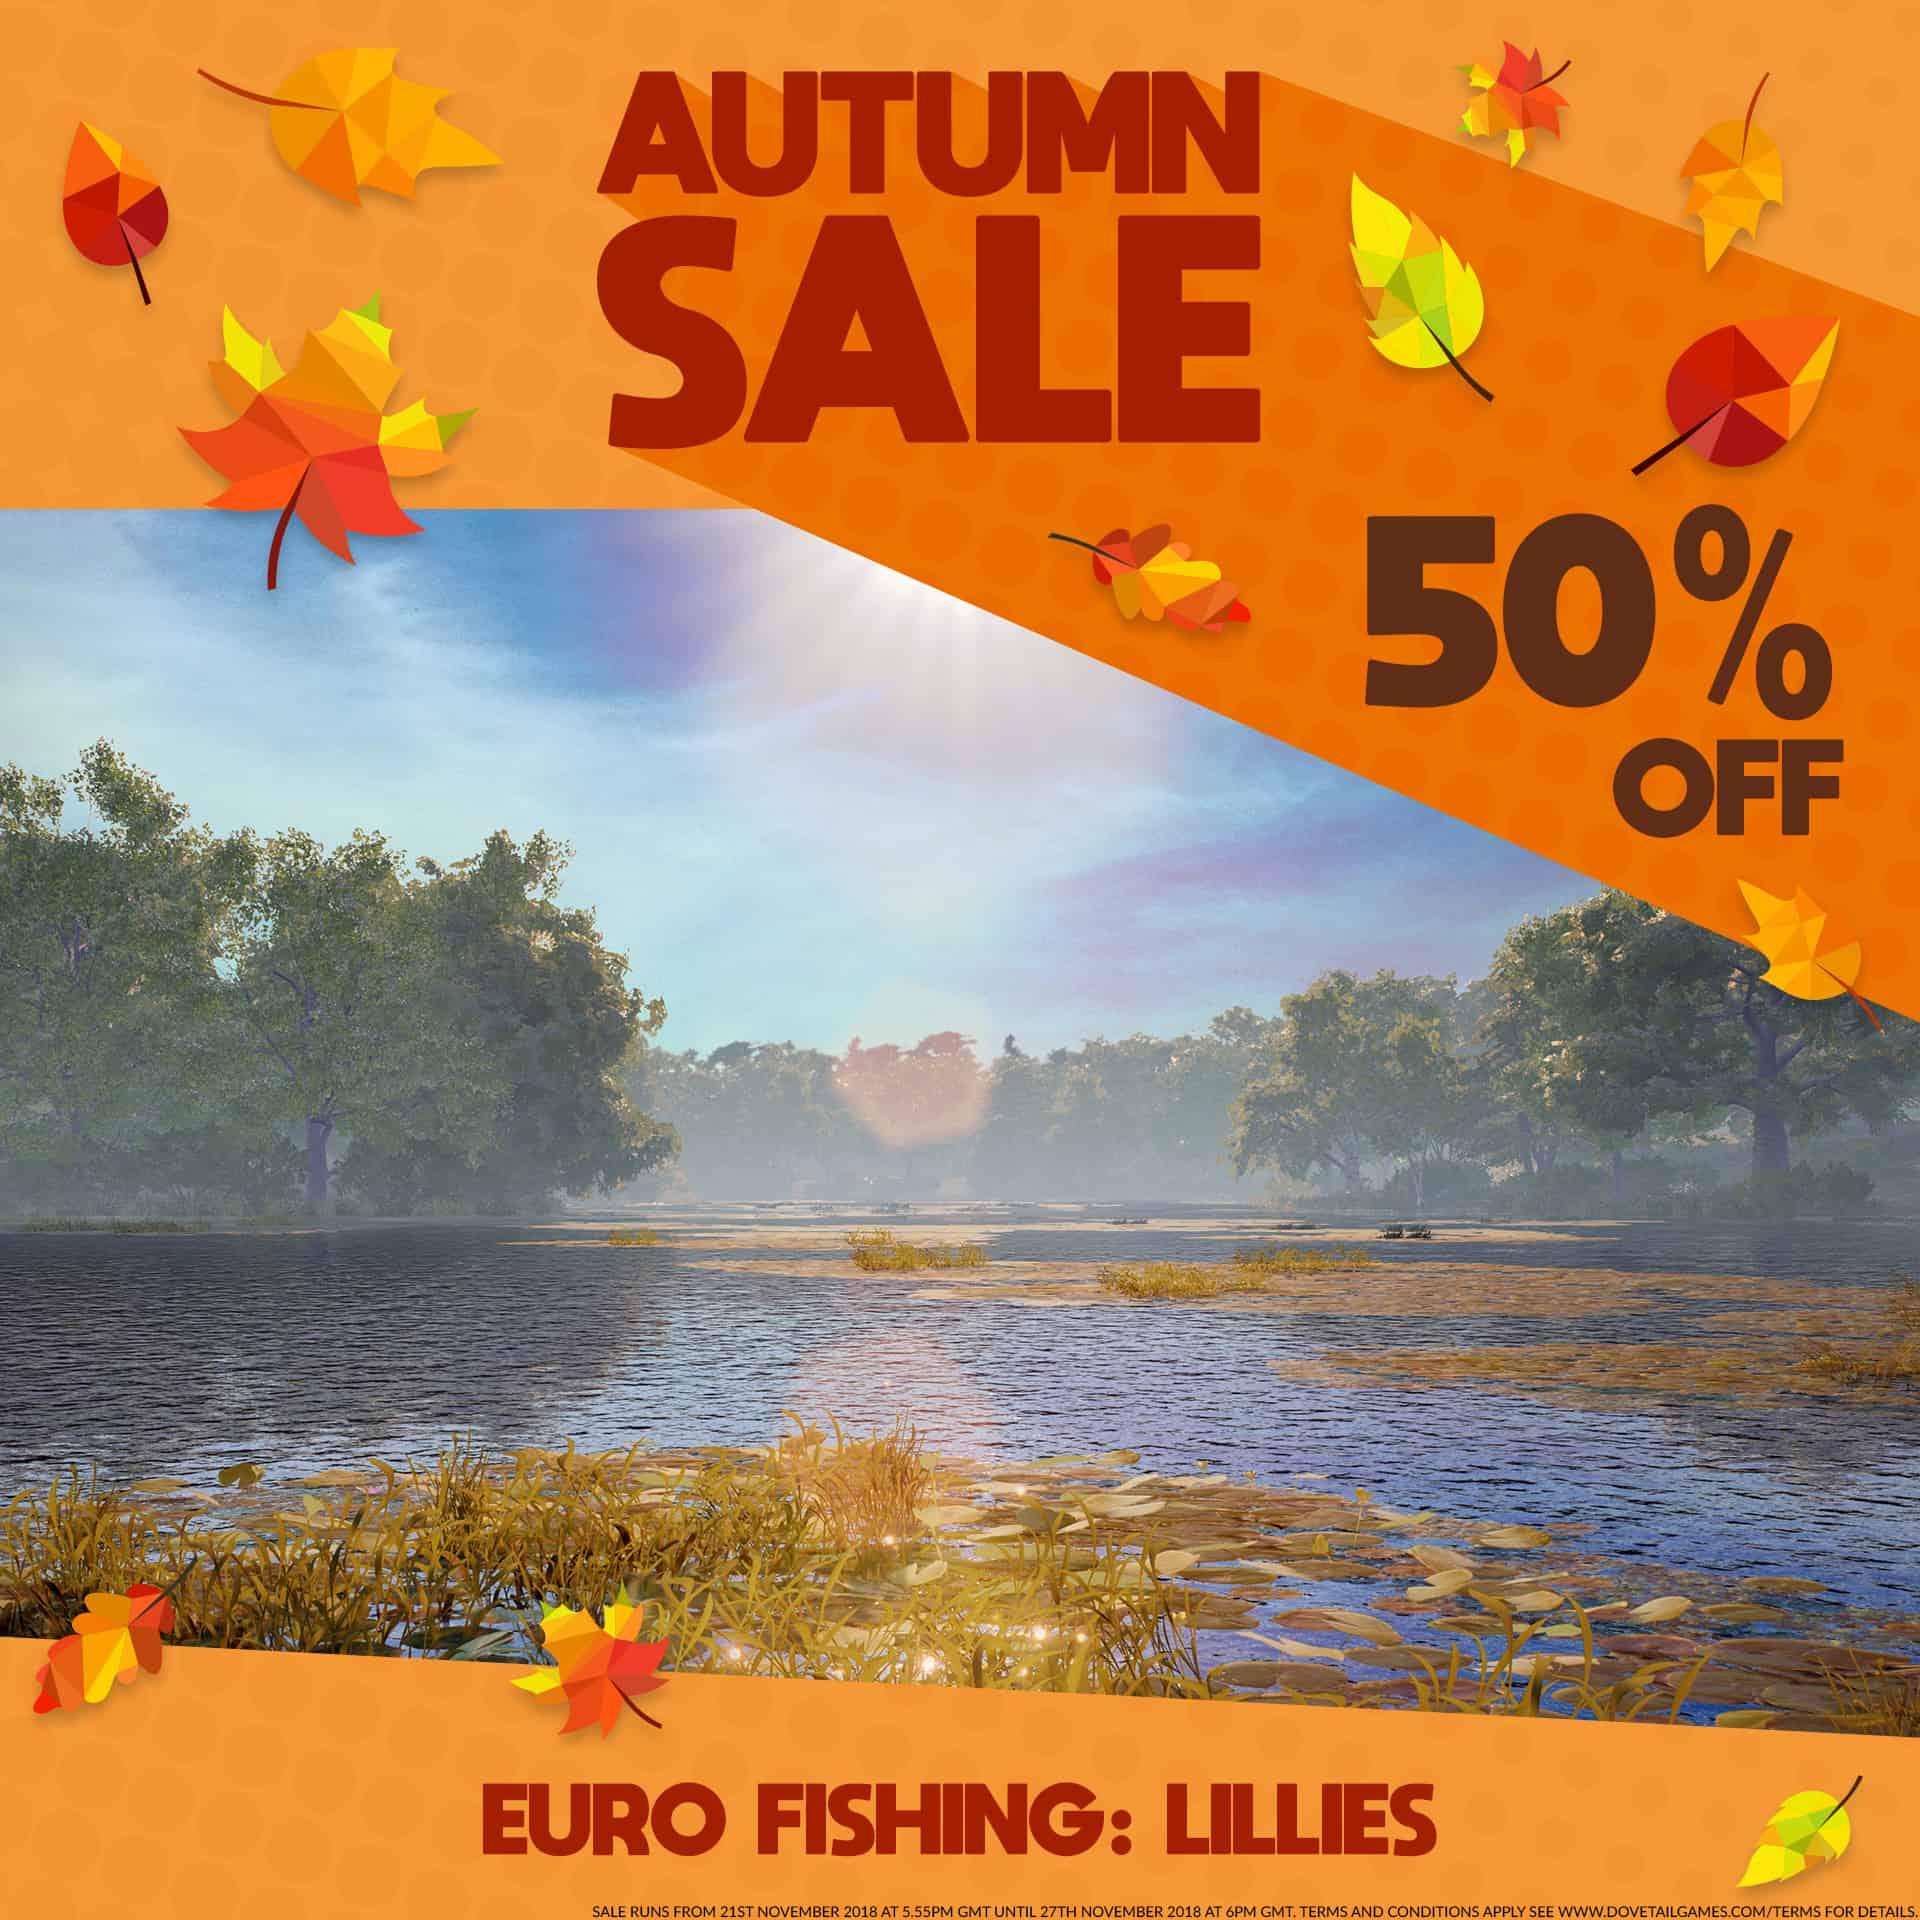 AutumnSale_Products_Lillies